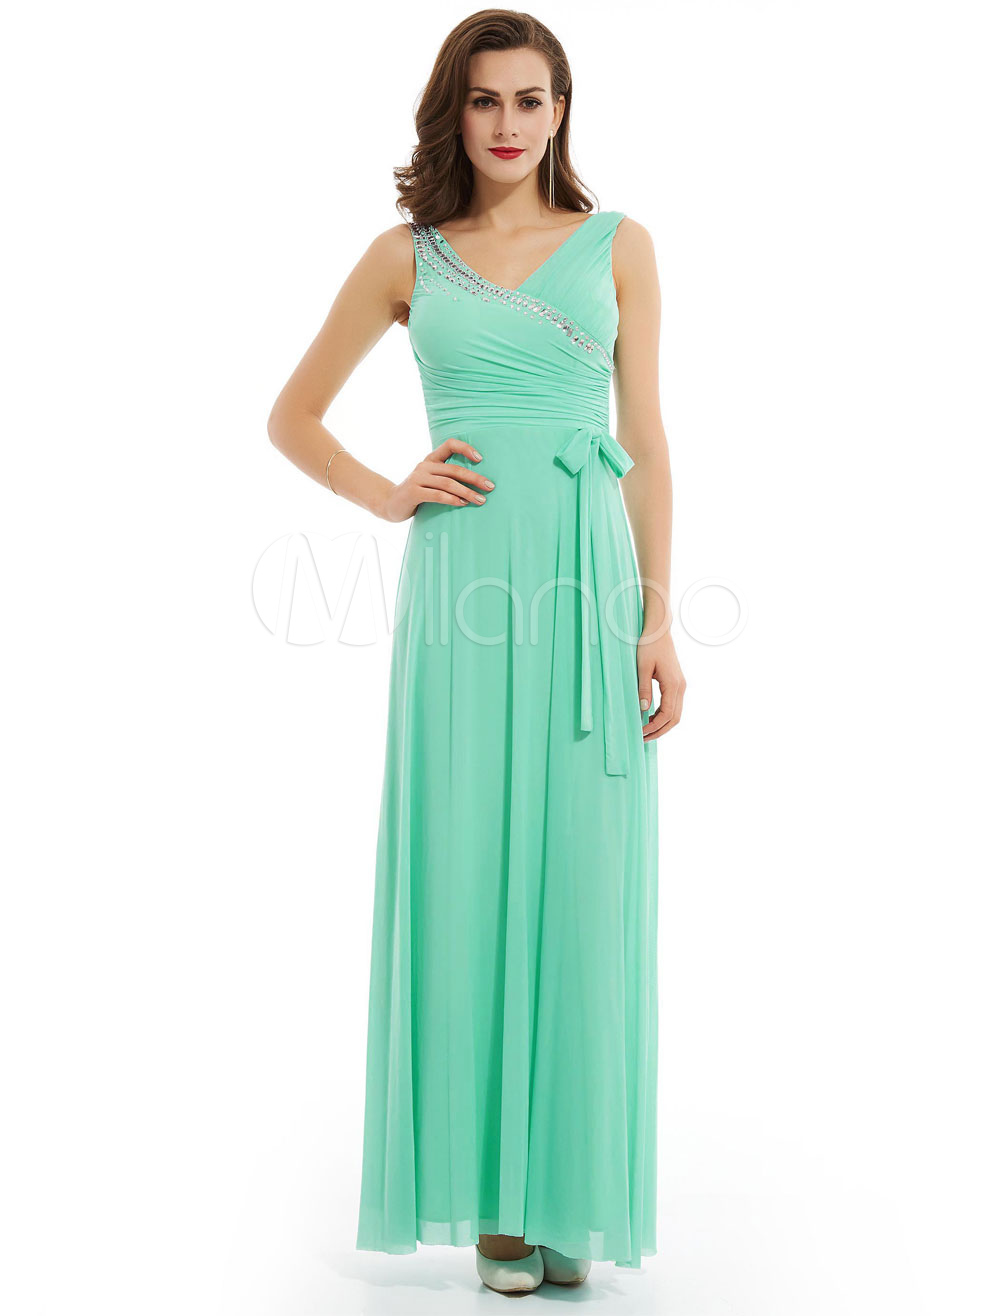 Prom Dresses Long Mint Green V Neck Beading Ribbon Bow Chiffon Floor Length Formal Party Dress (Wedding) photo